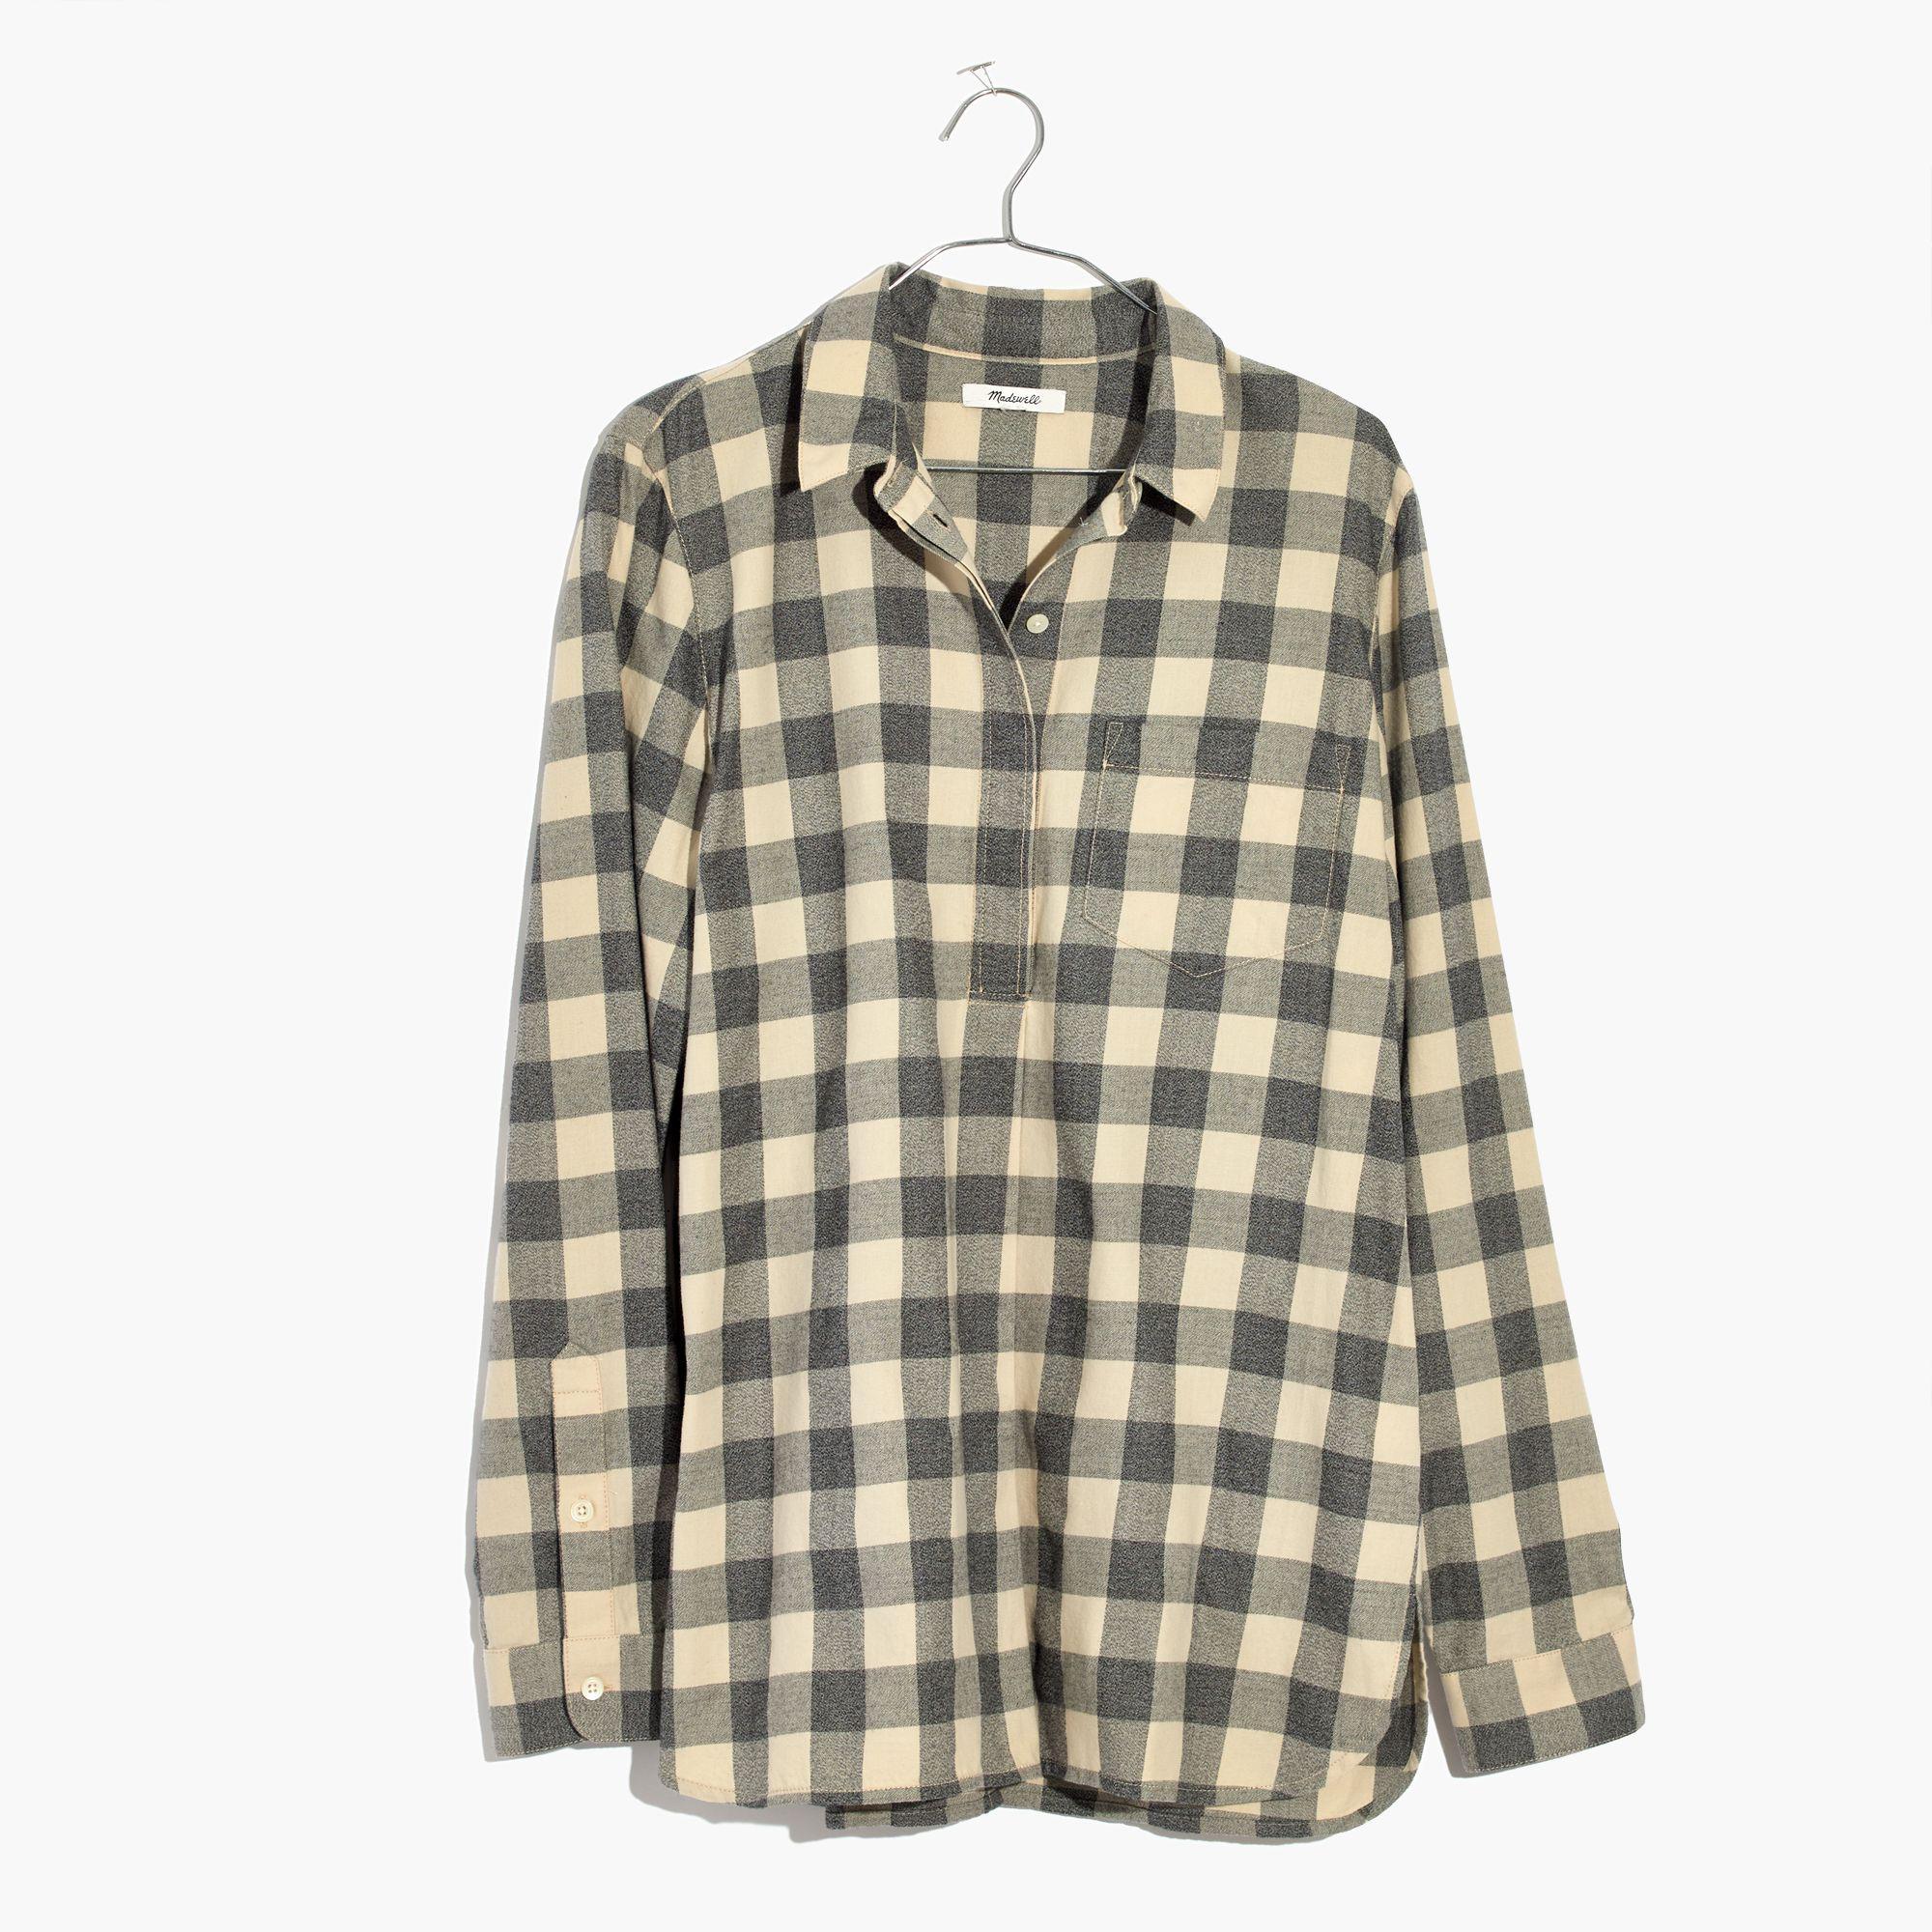 96b08982d2f Lyst - Madewell Classic Ex-boyfriend Button-back Shirt In Buffalo Check